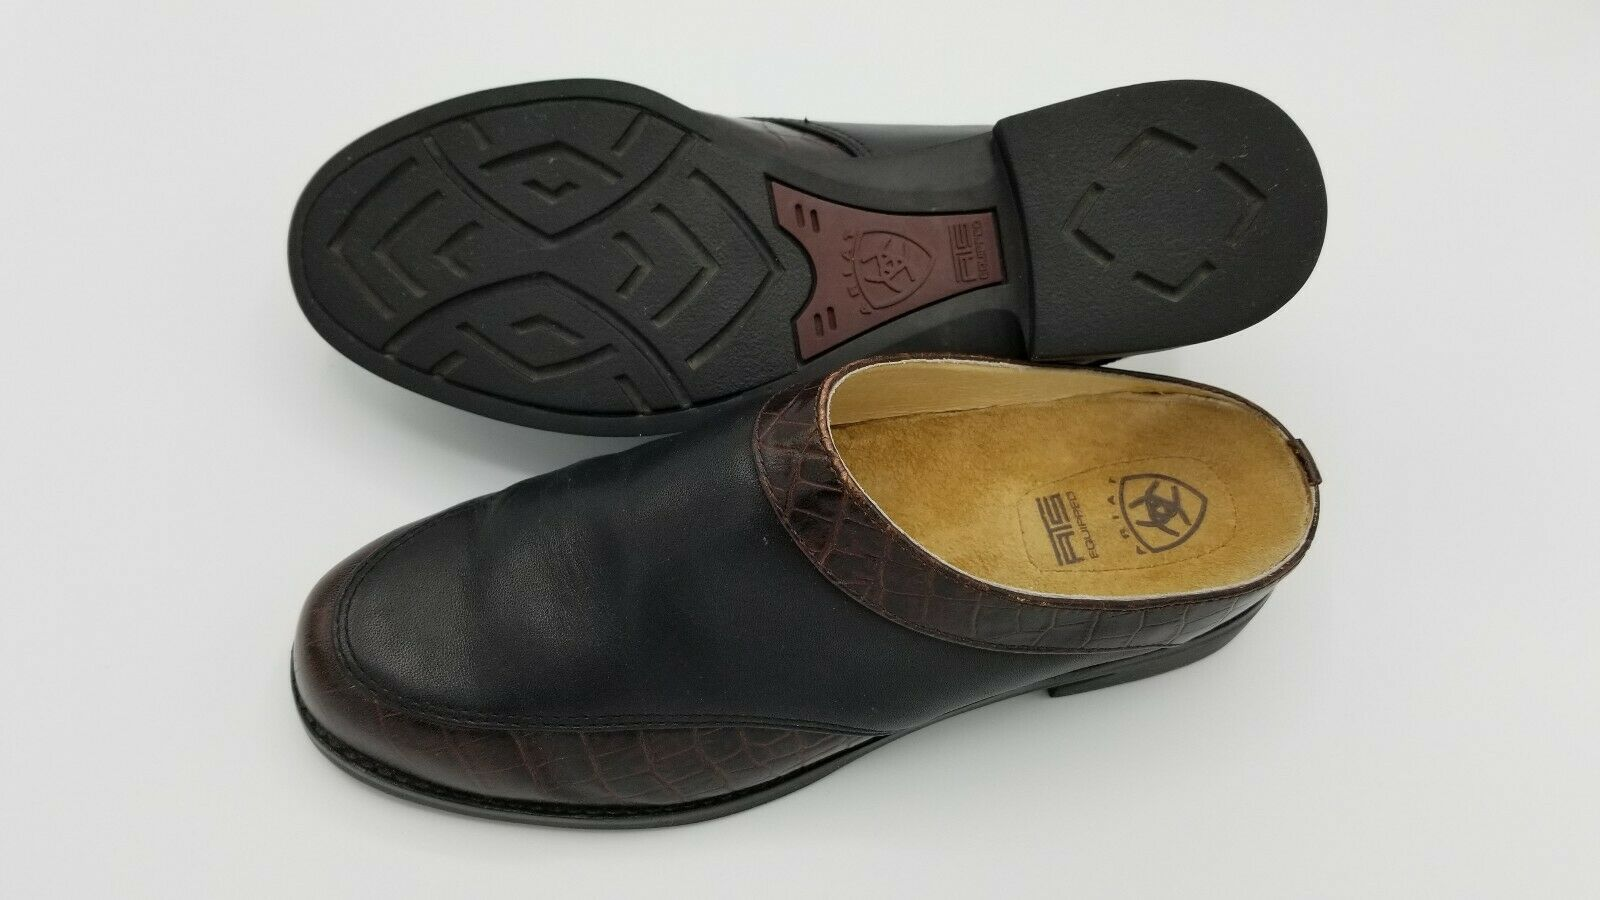 Ariat 94302 Black Leather Croc Print Slip On Mules Heel Shoes Women's US 6 B Med